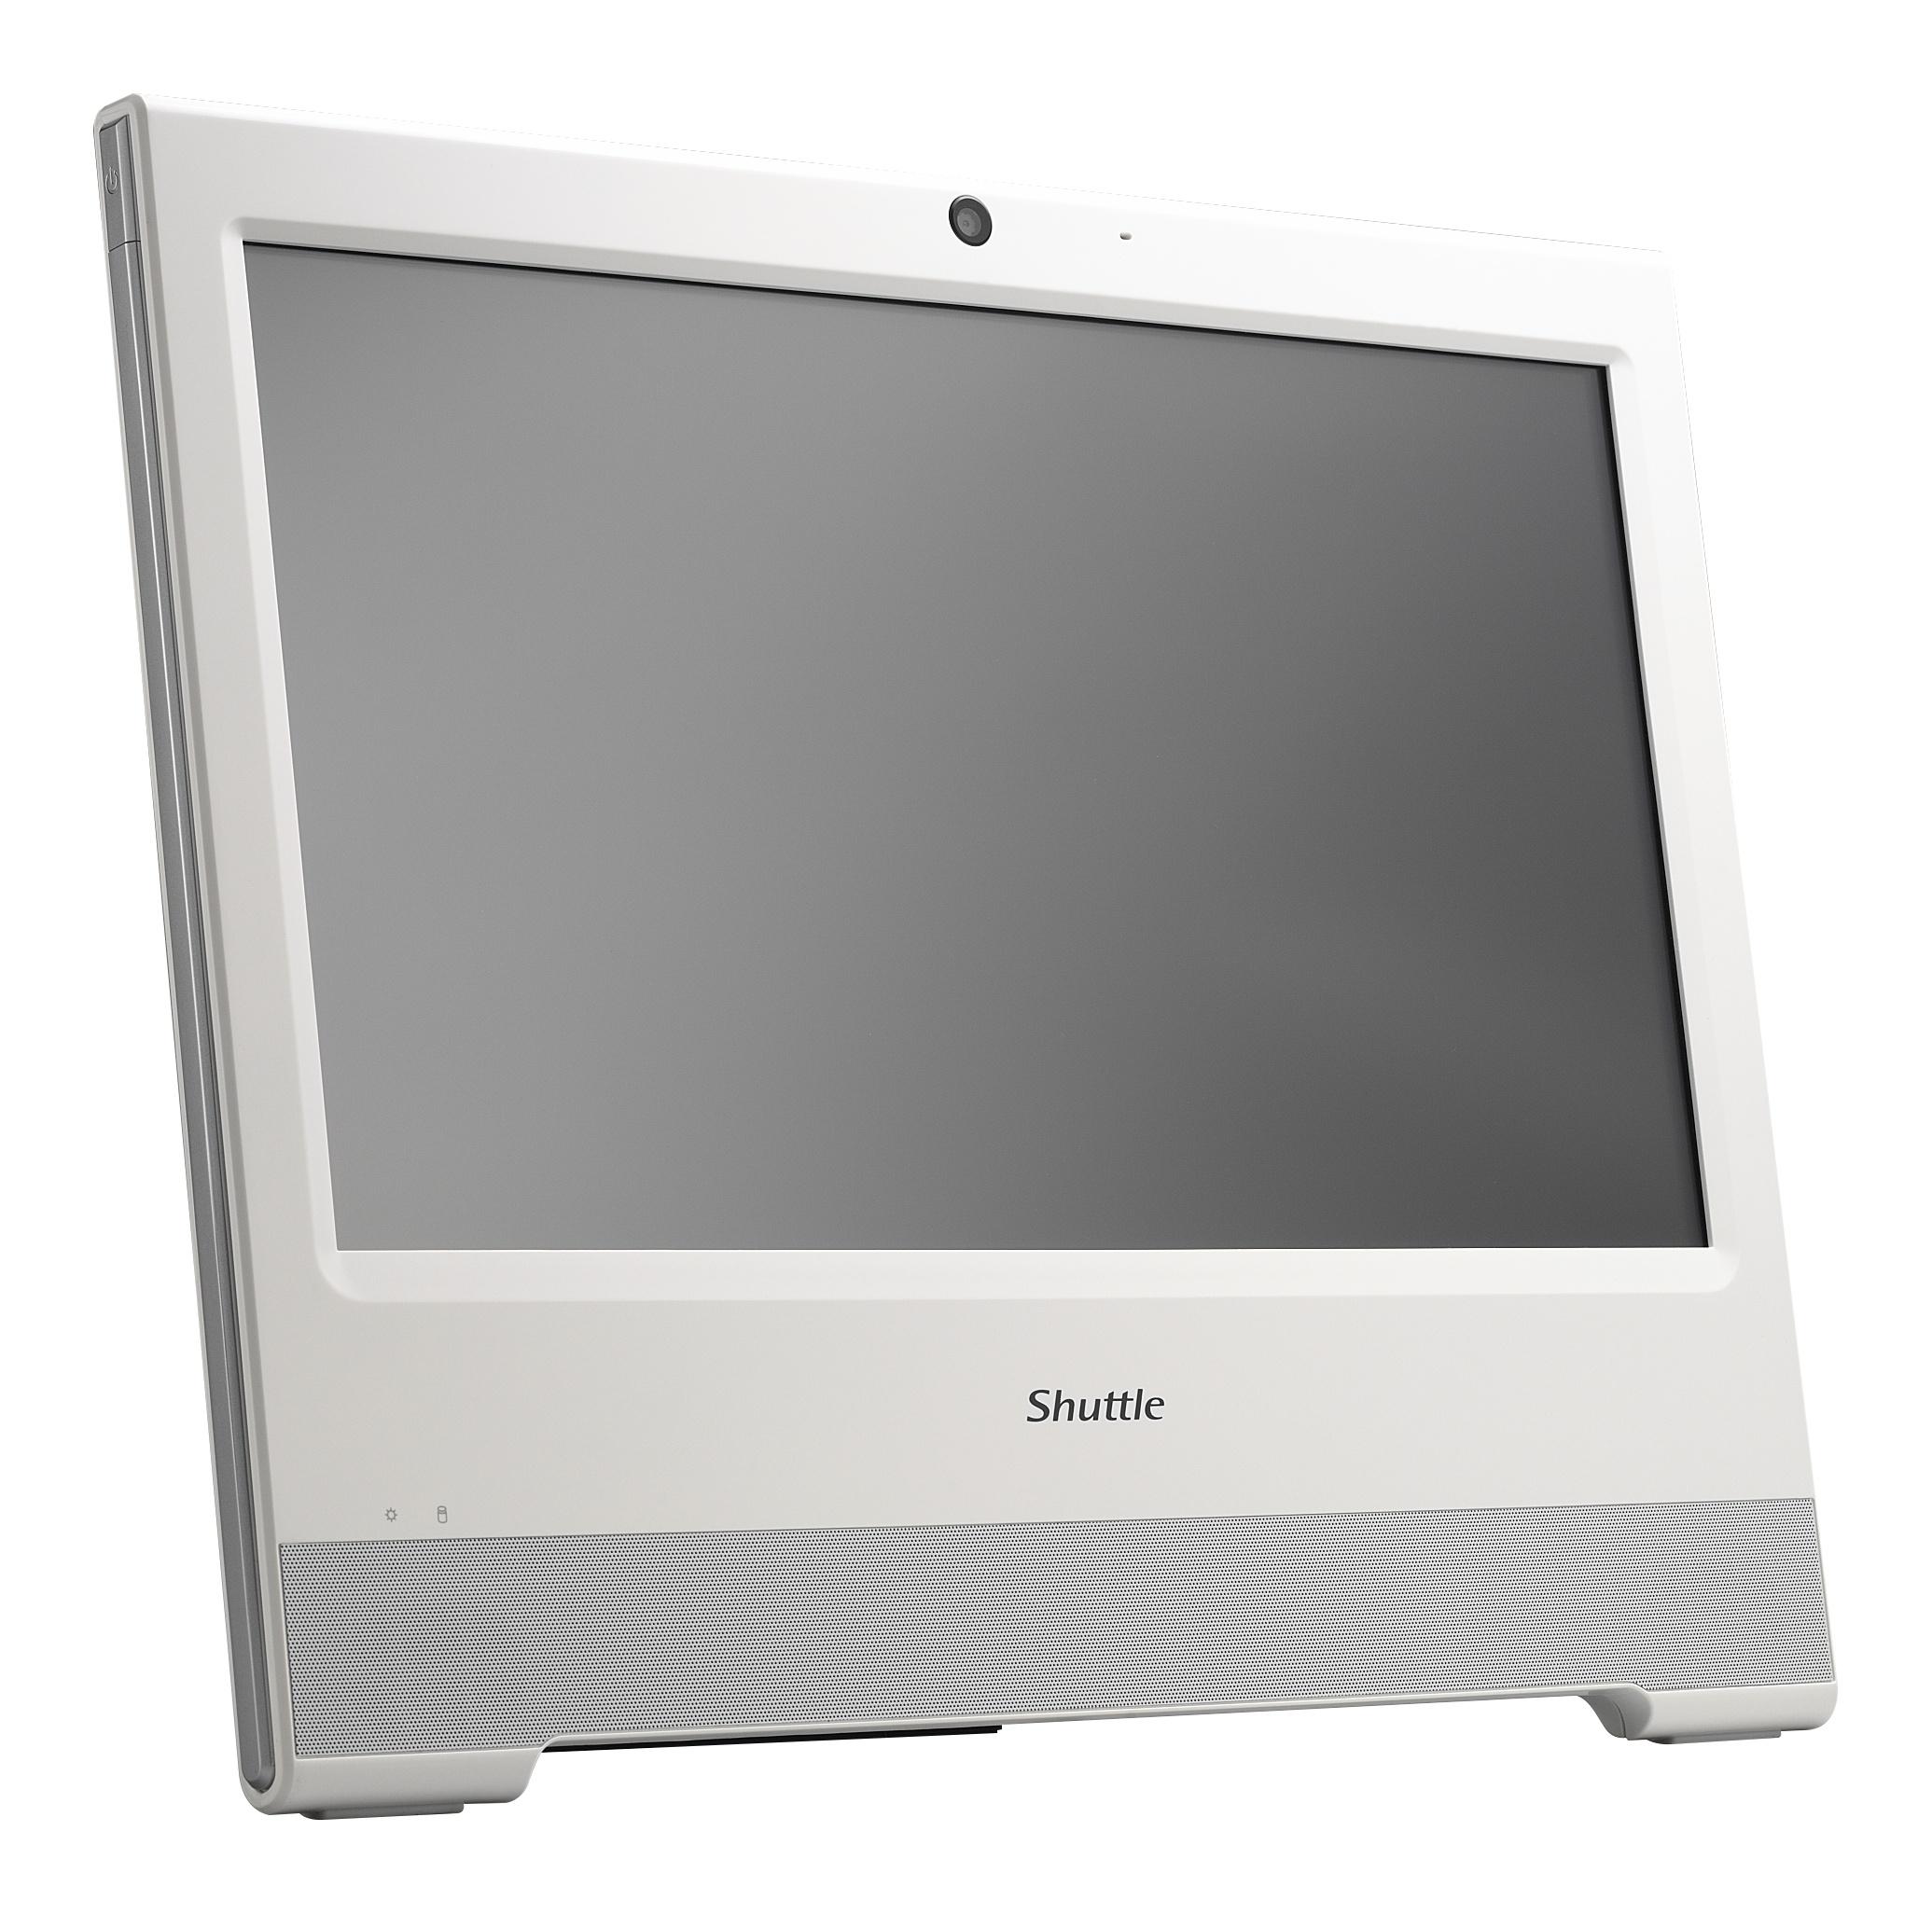 Shuttle All-in-One X506 A - Komplettsystem - Celeron 2,13 GHz - RAM: 4.096 MB DDR4 - HDD: 60 GB Serial ATA - HD 600